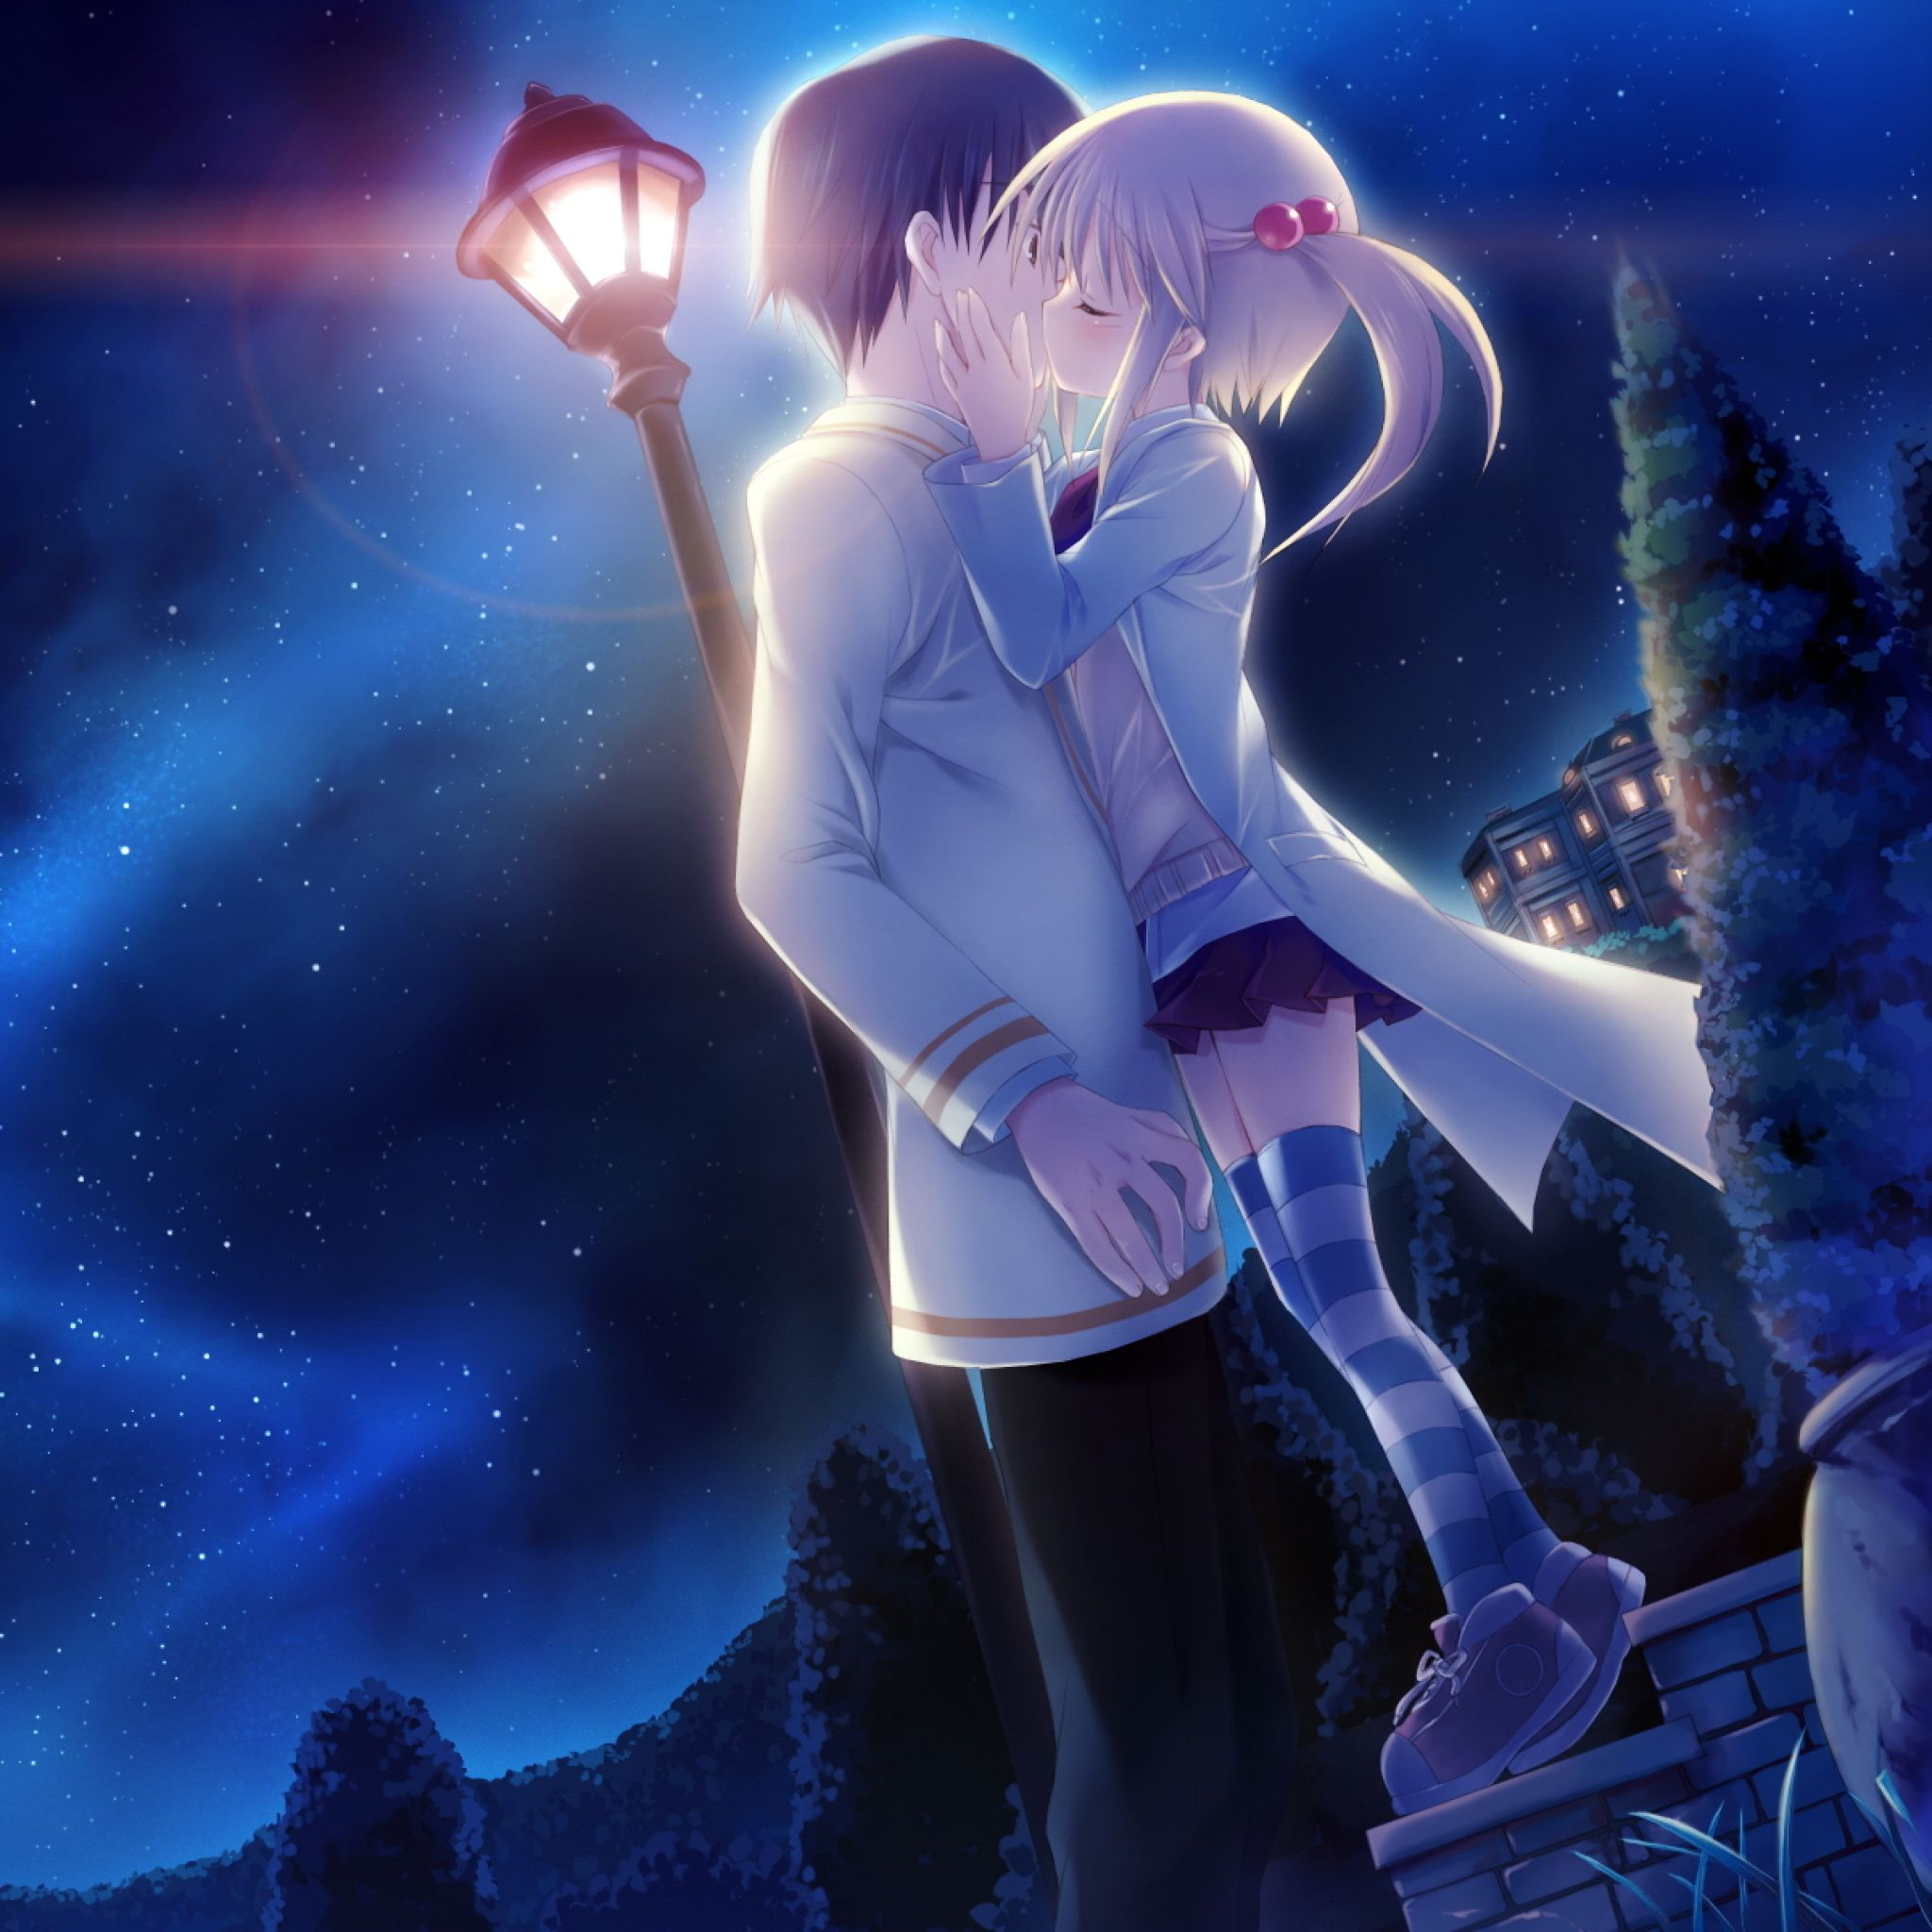 Anime Love Wallpaper Hd 3d gambar ke 9